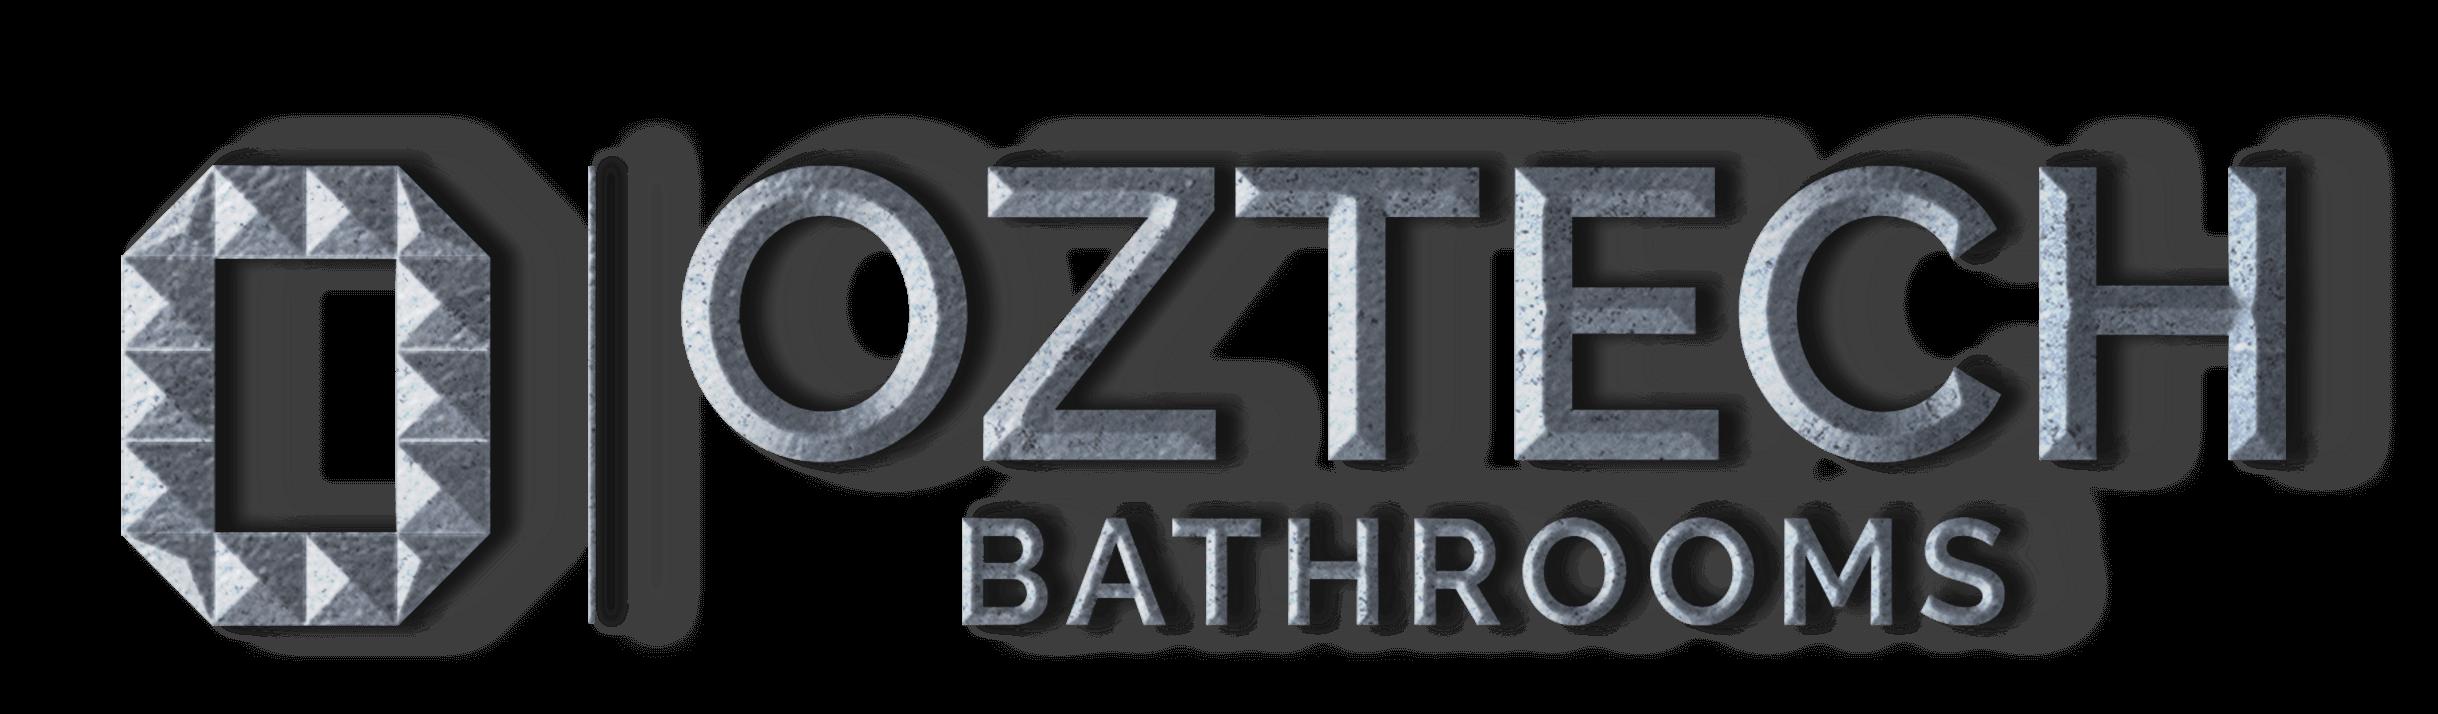 OZ Tech Bathroom